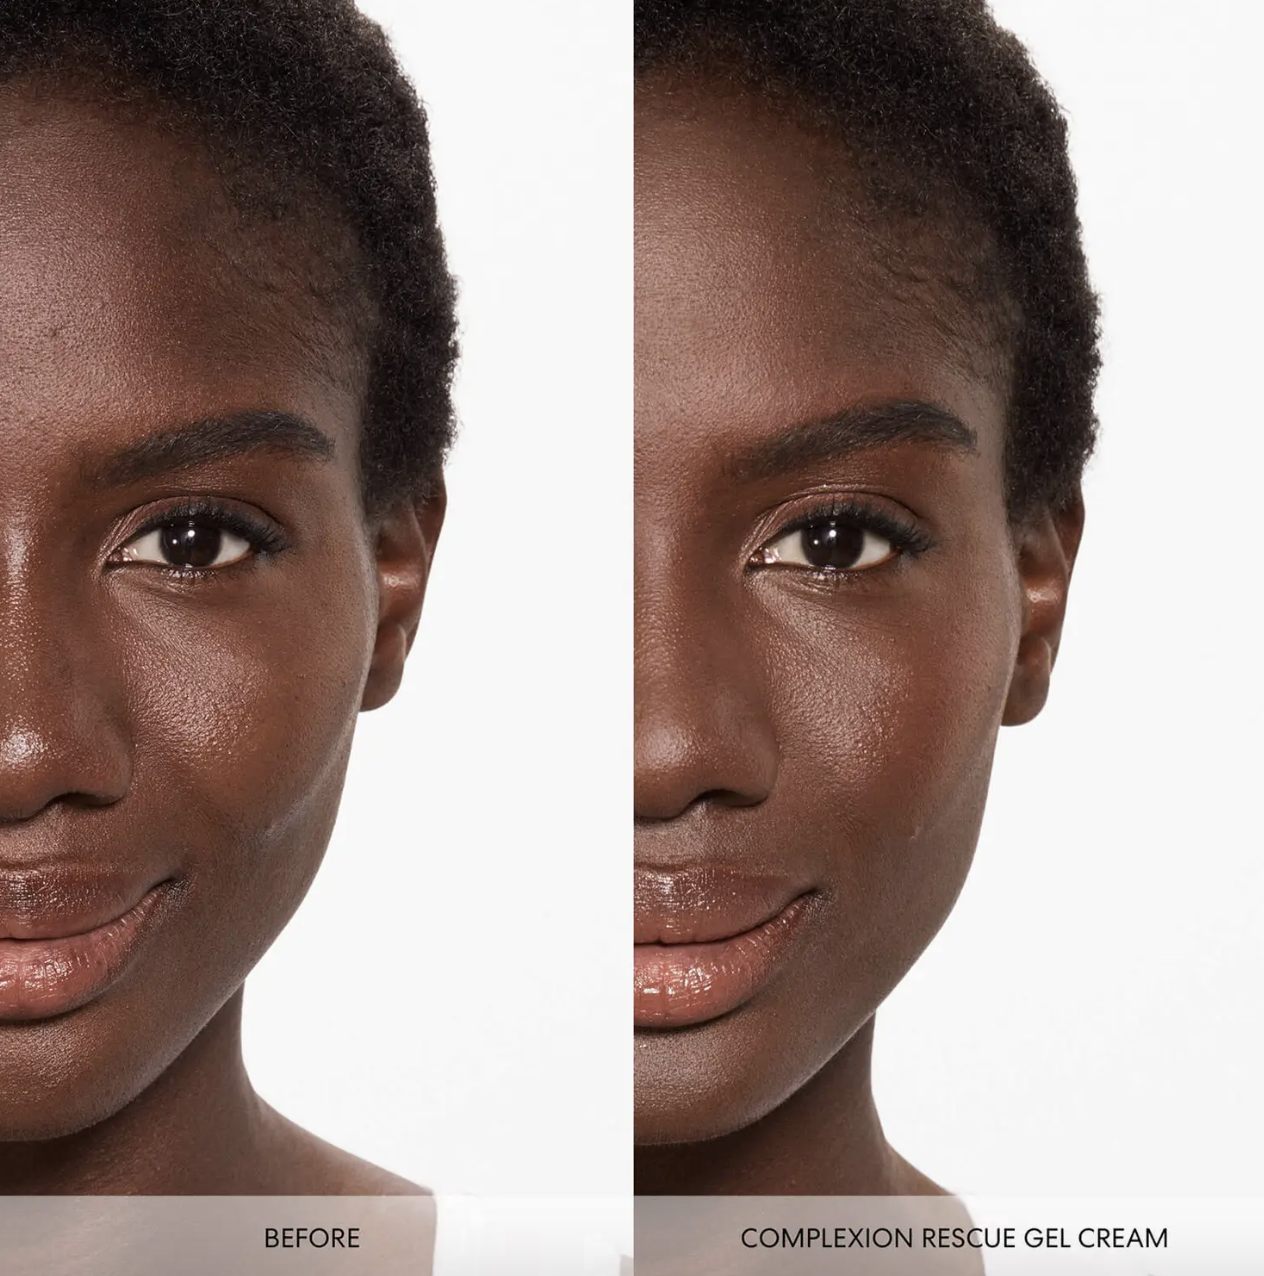 model using the tinted gel cream